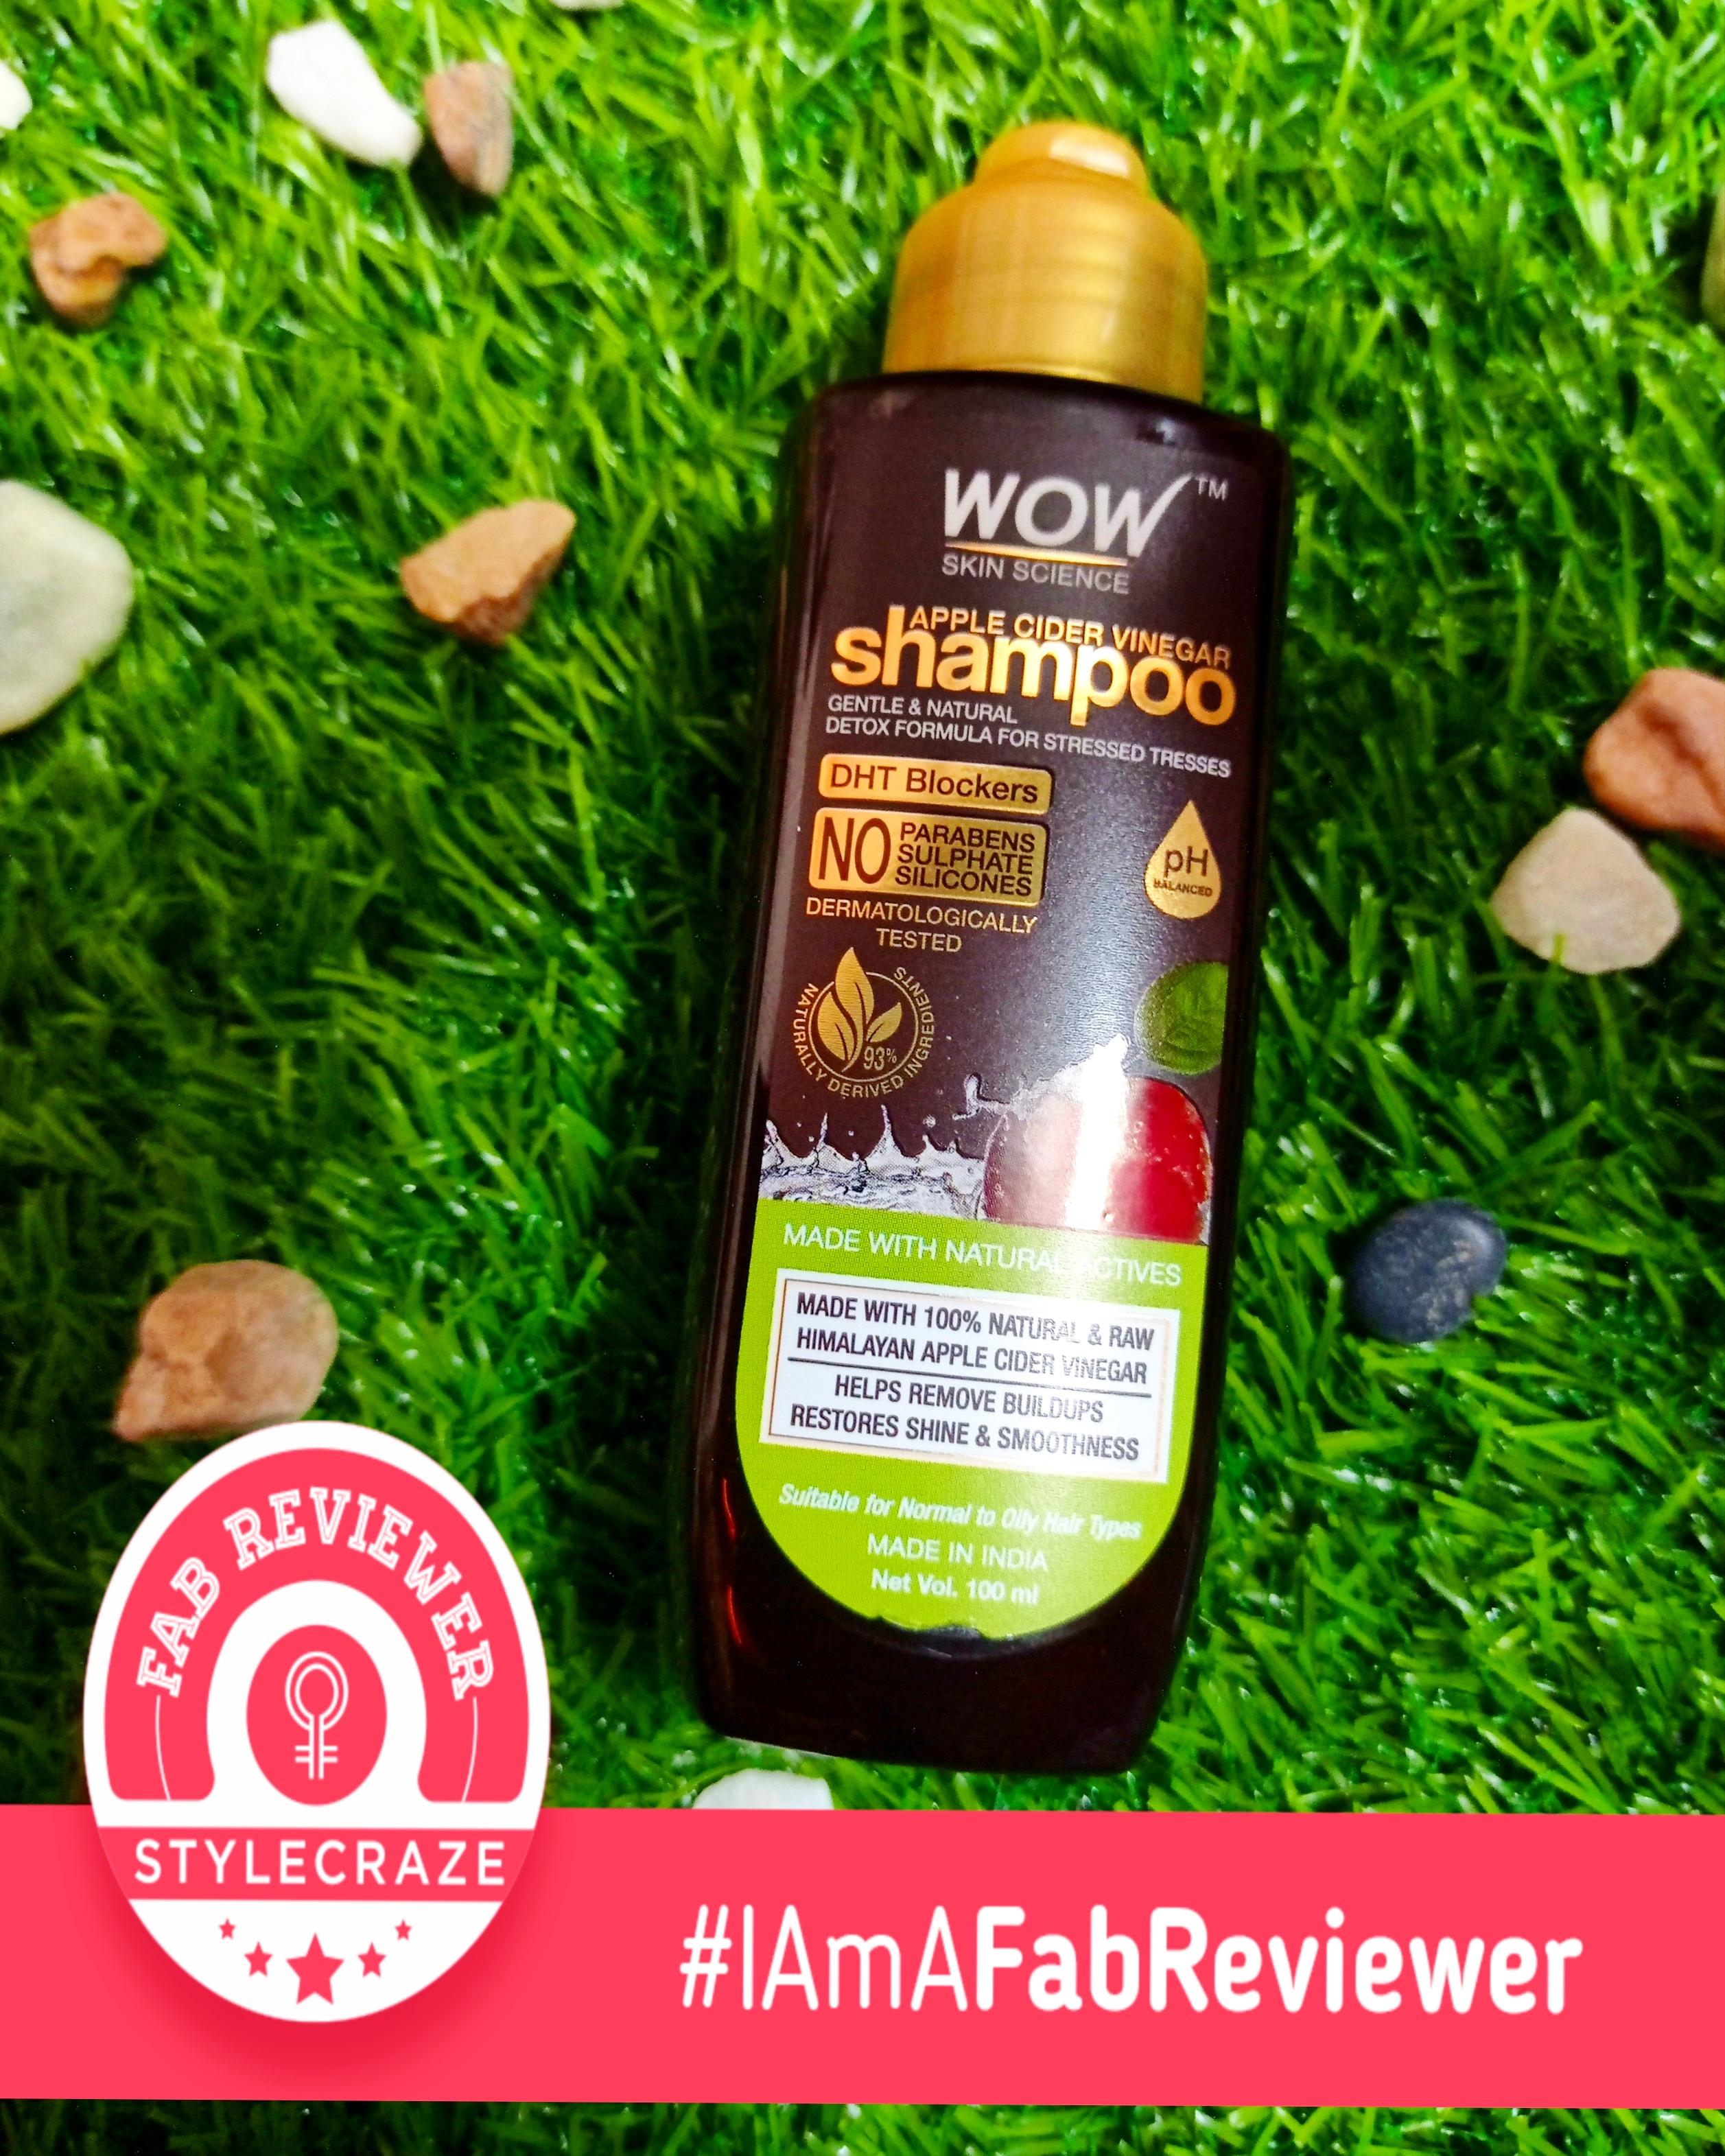 WOW Skin Science Apple Cider Vinegar Shampoo – No Parabens & Sulphate – 300 ml -Its just Wow-By nagapriya